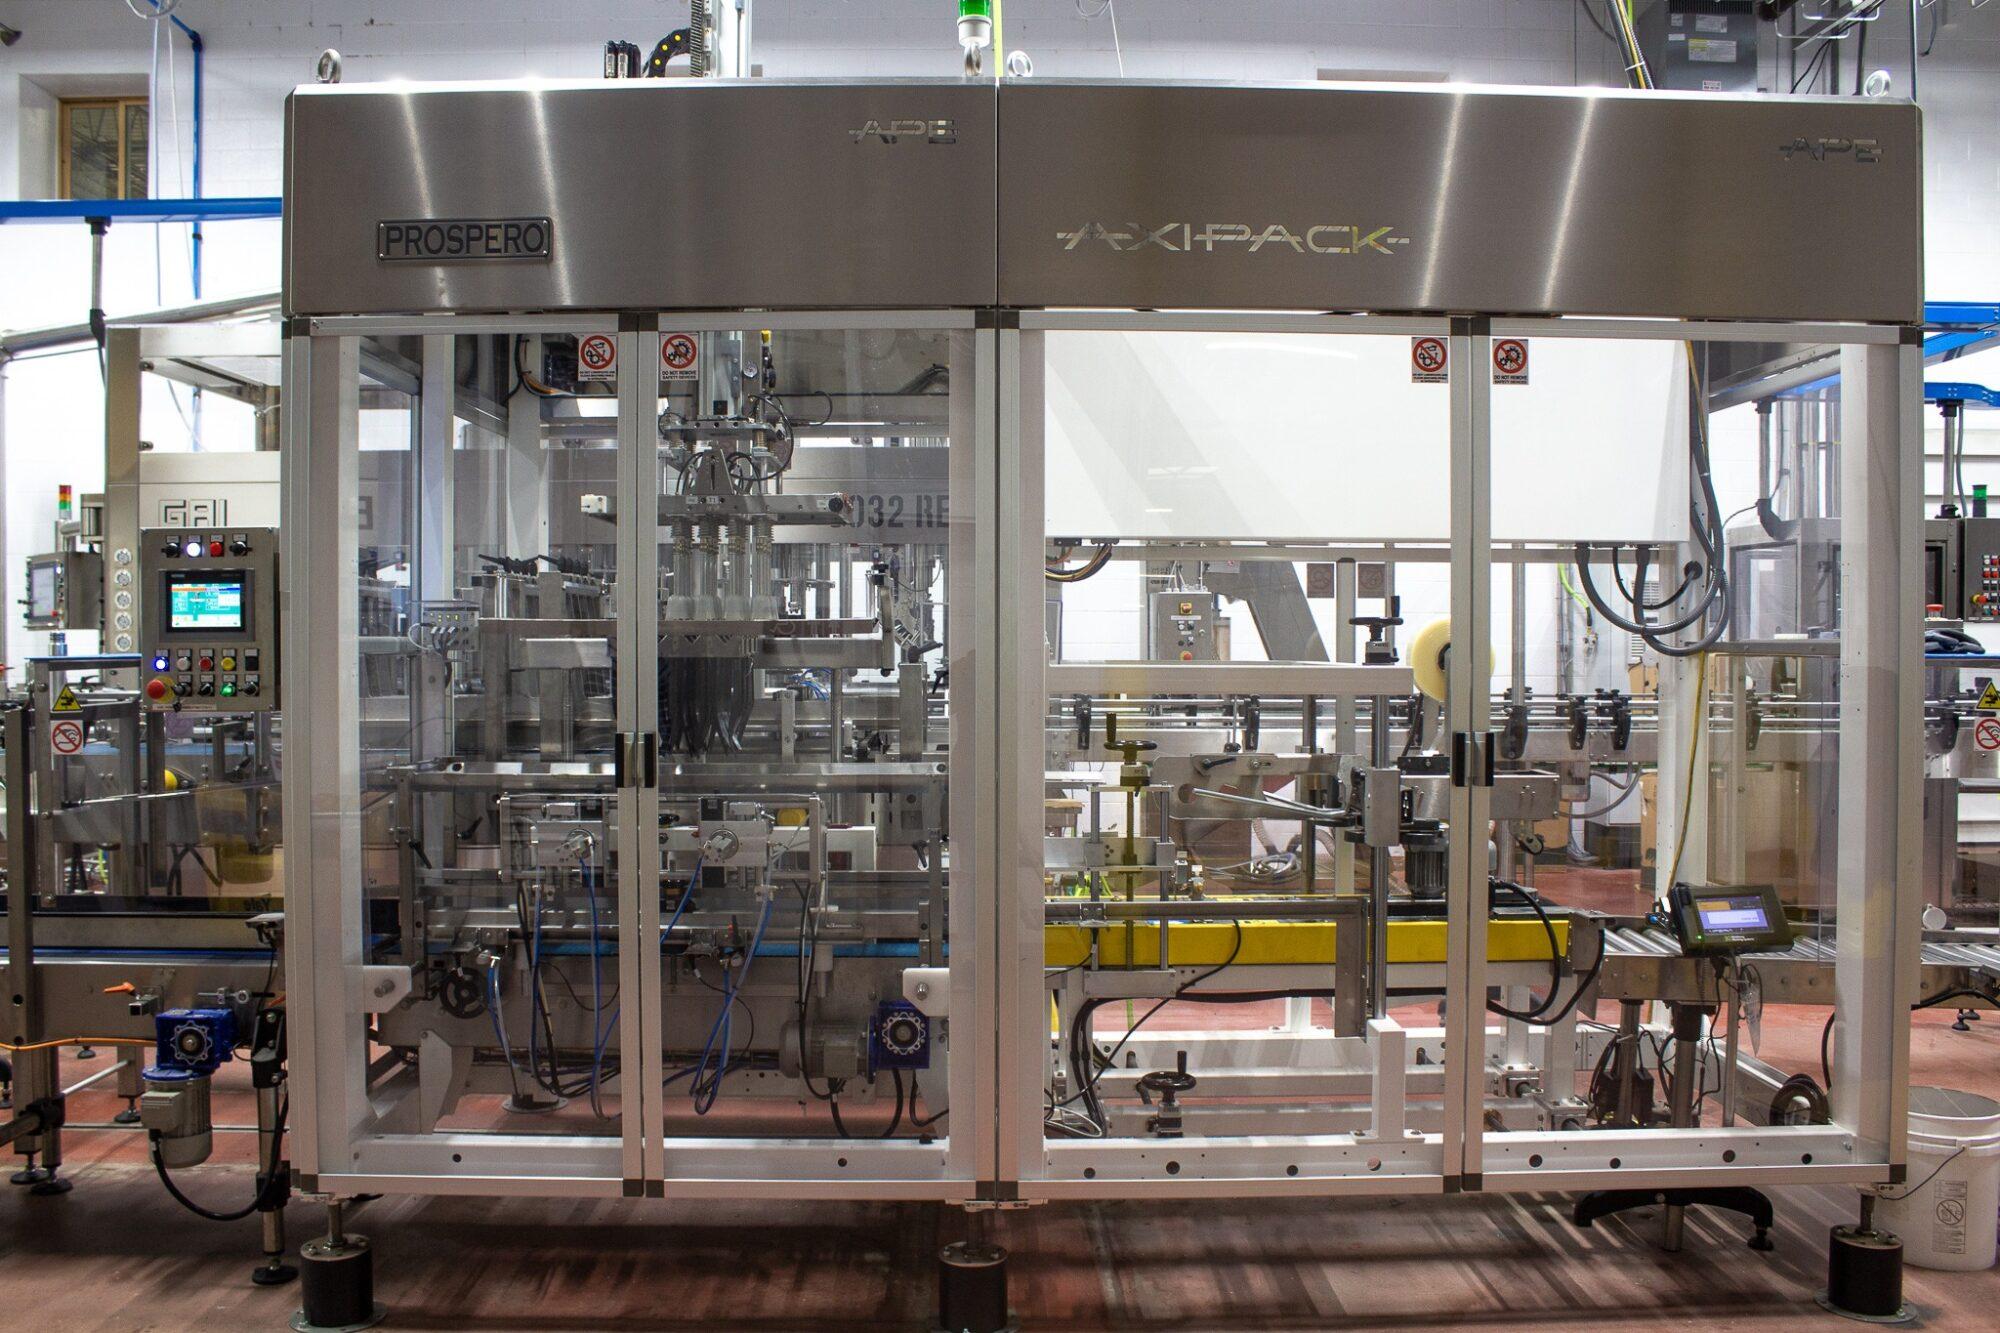 Production Line with bottling dispenser